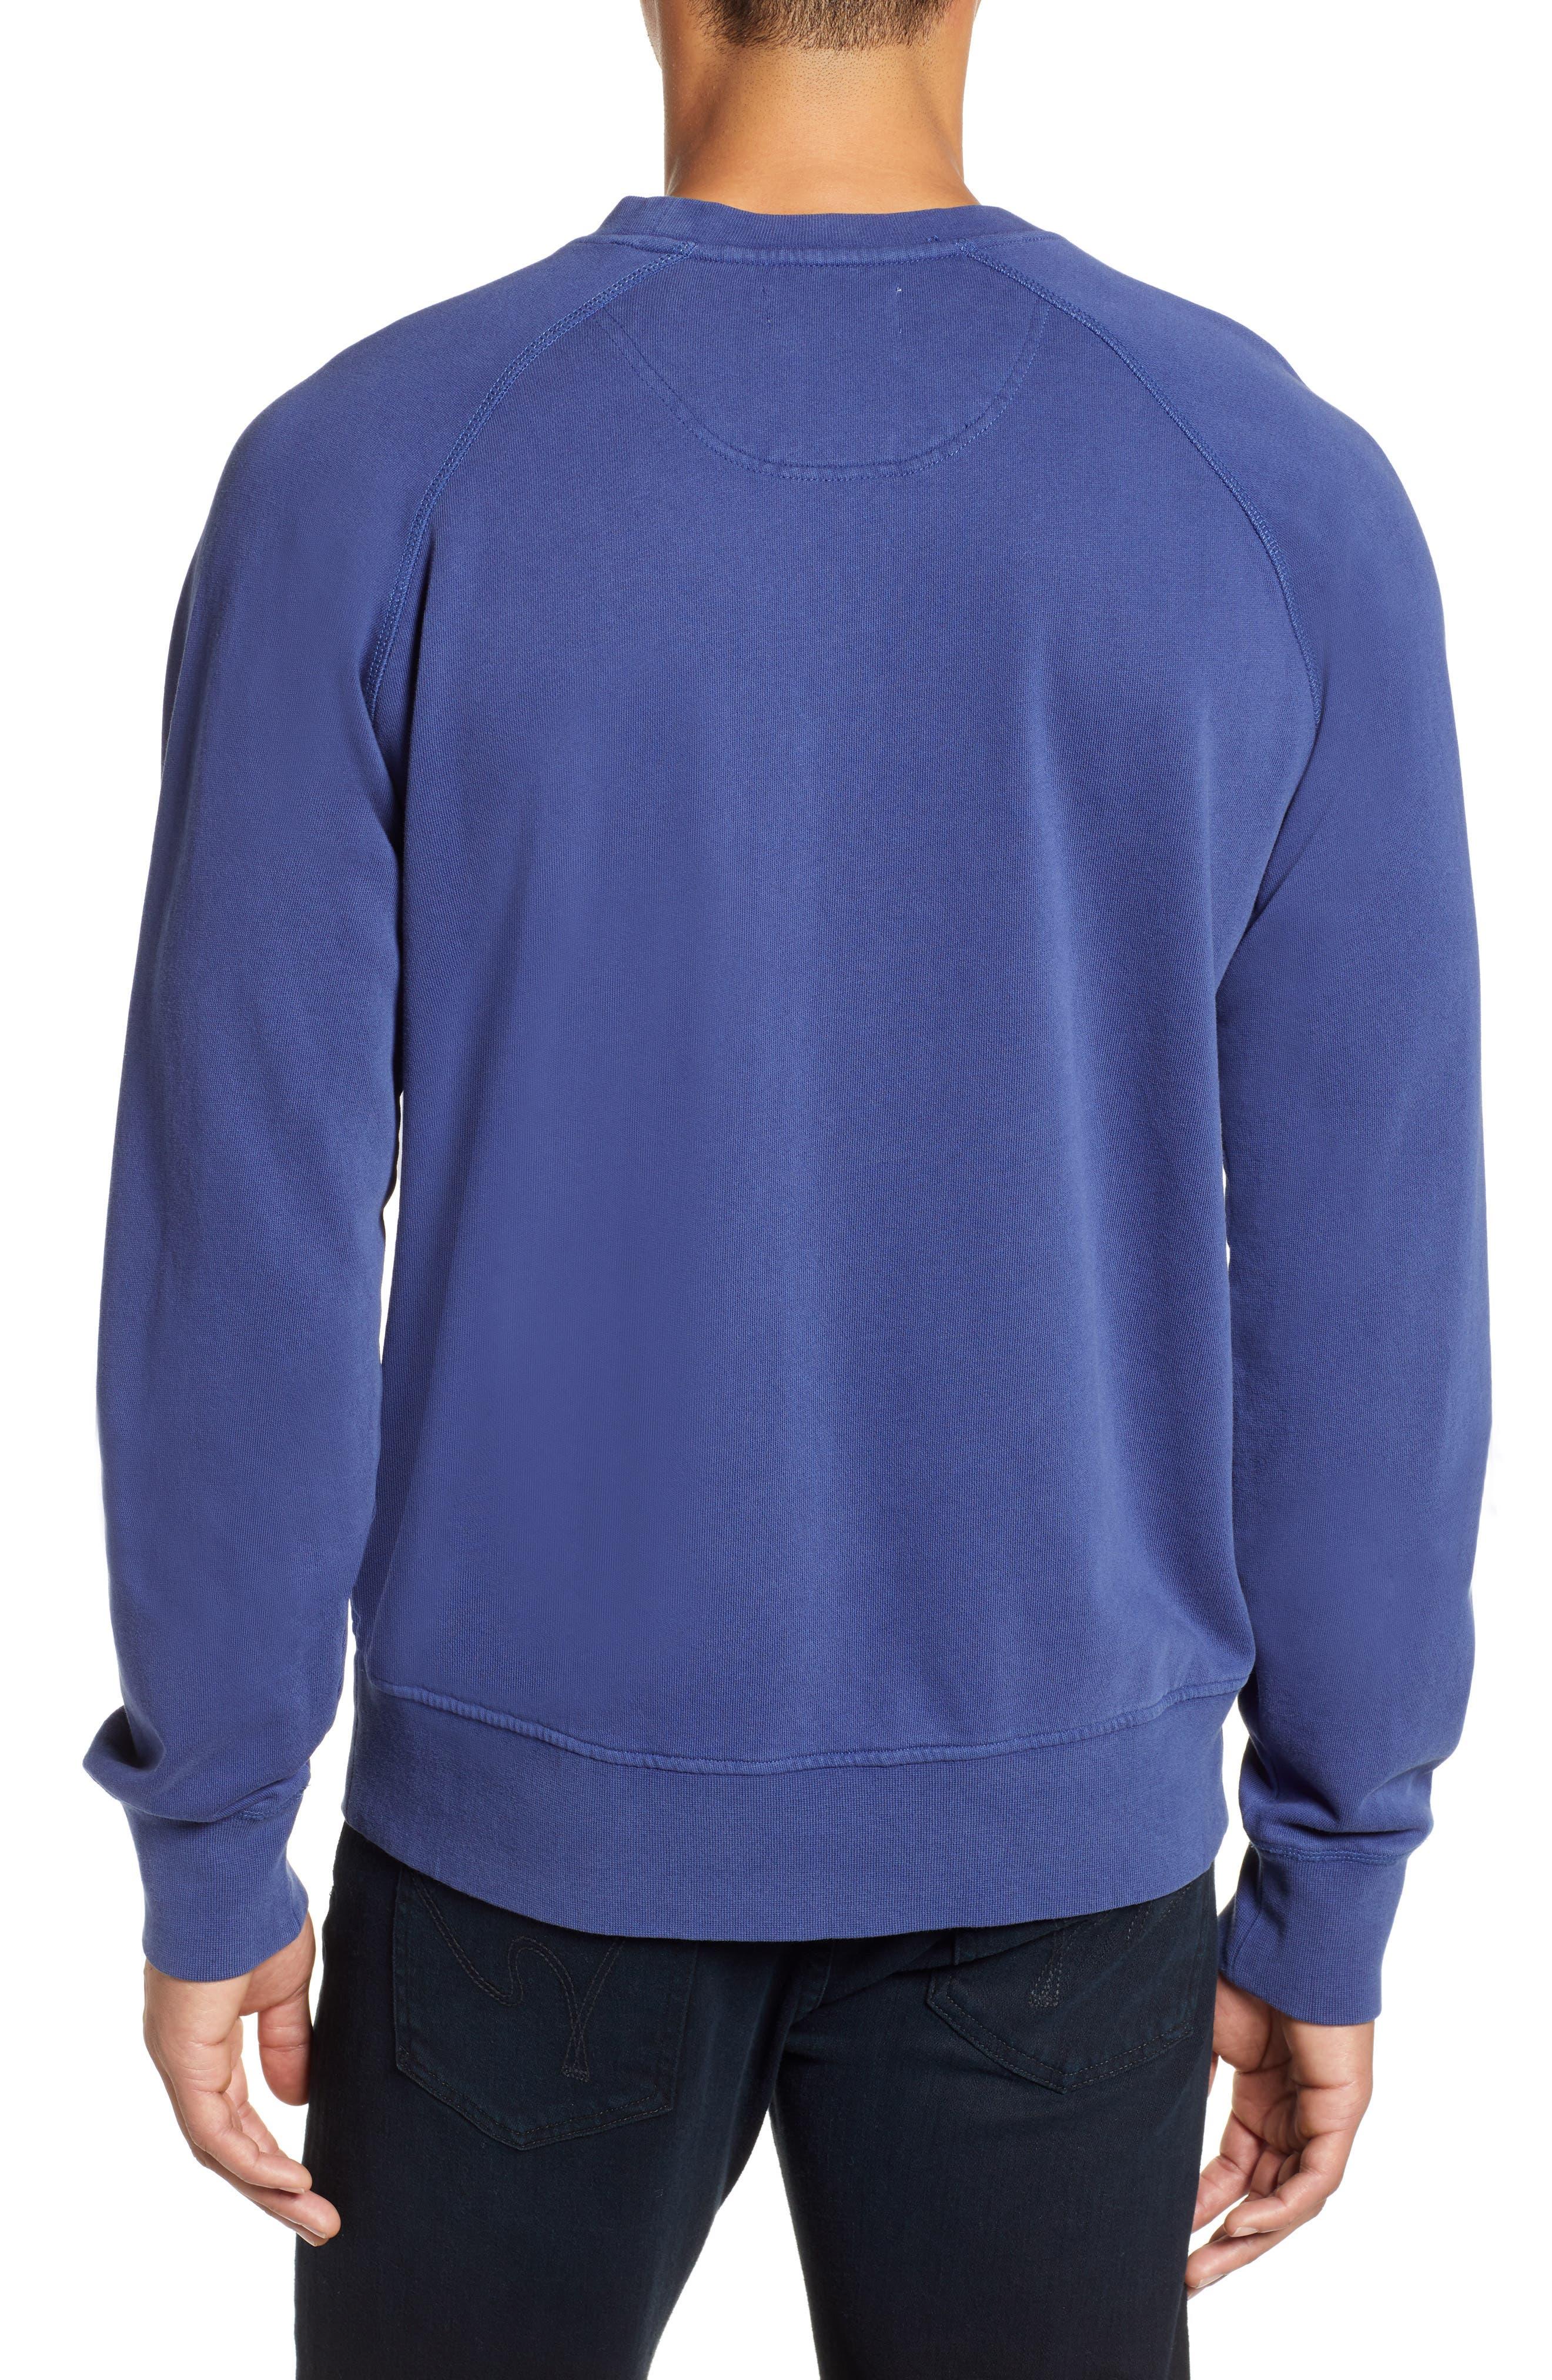 Dunham Crewneck Sweatshirt,                             Alternate thumbnail 2, color,                             BLUE PRINT